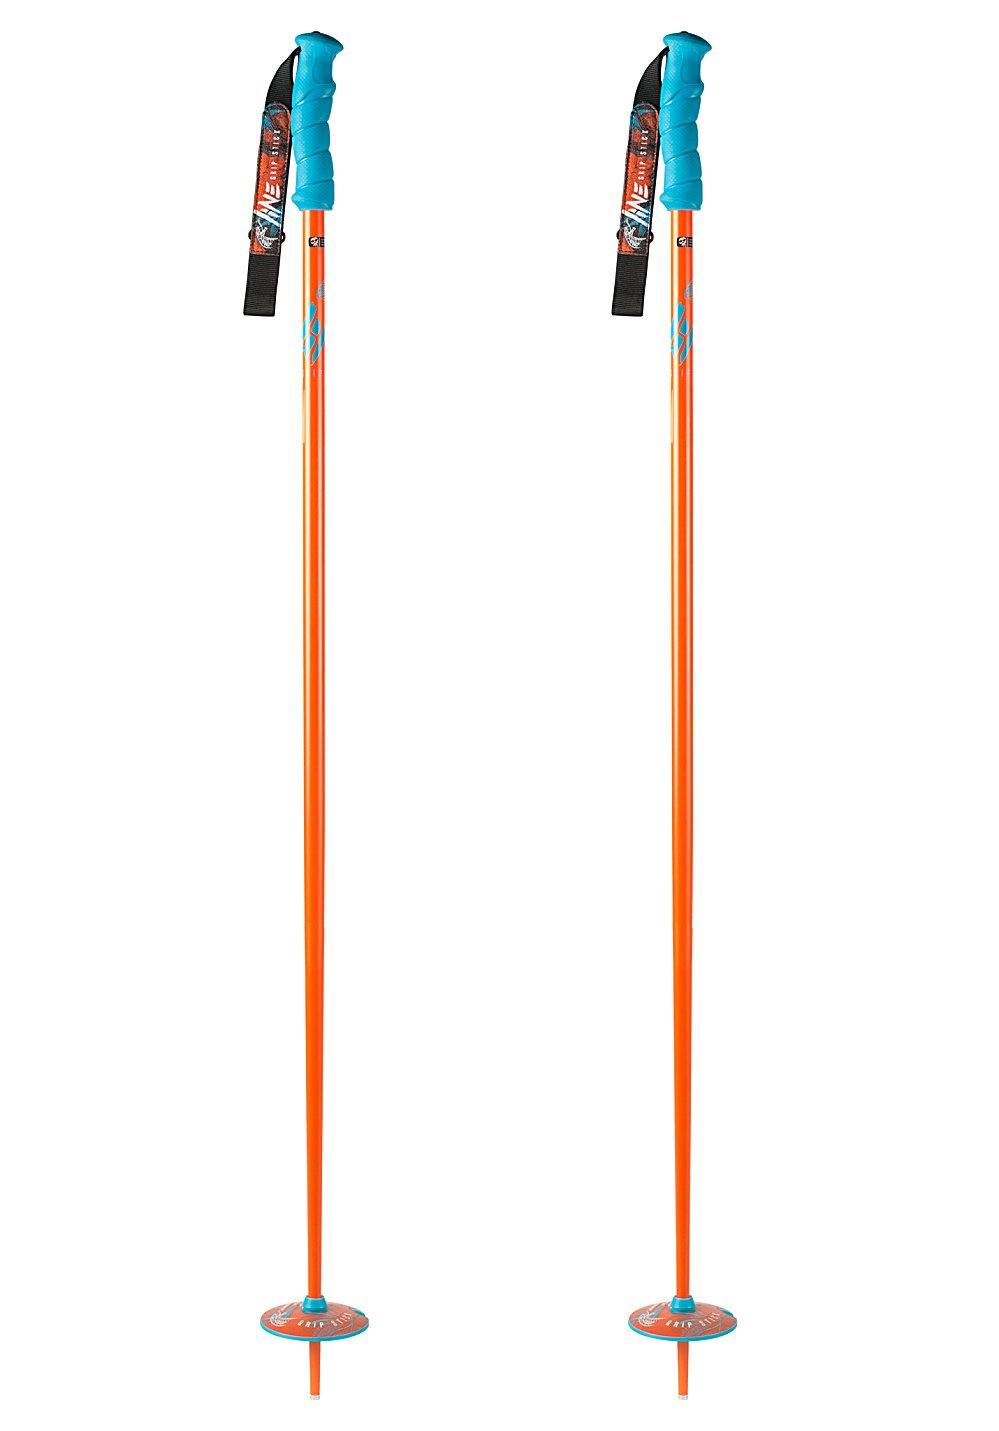 Line Grip Orange Orange Orange Pole 2017 Länge  105, 105 B01GEY0VIQ Stcke Moderne Technologie deee1e